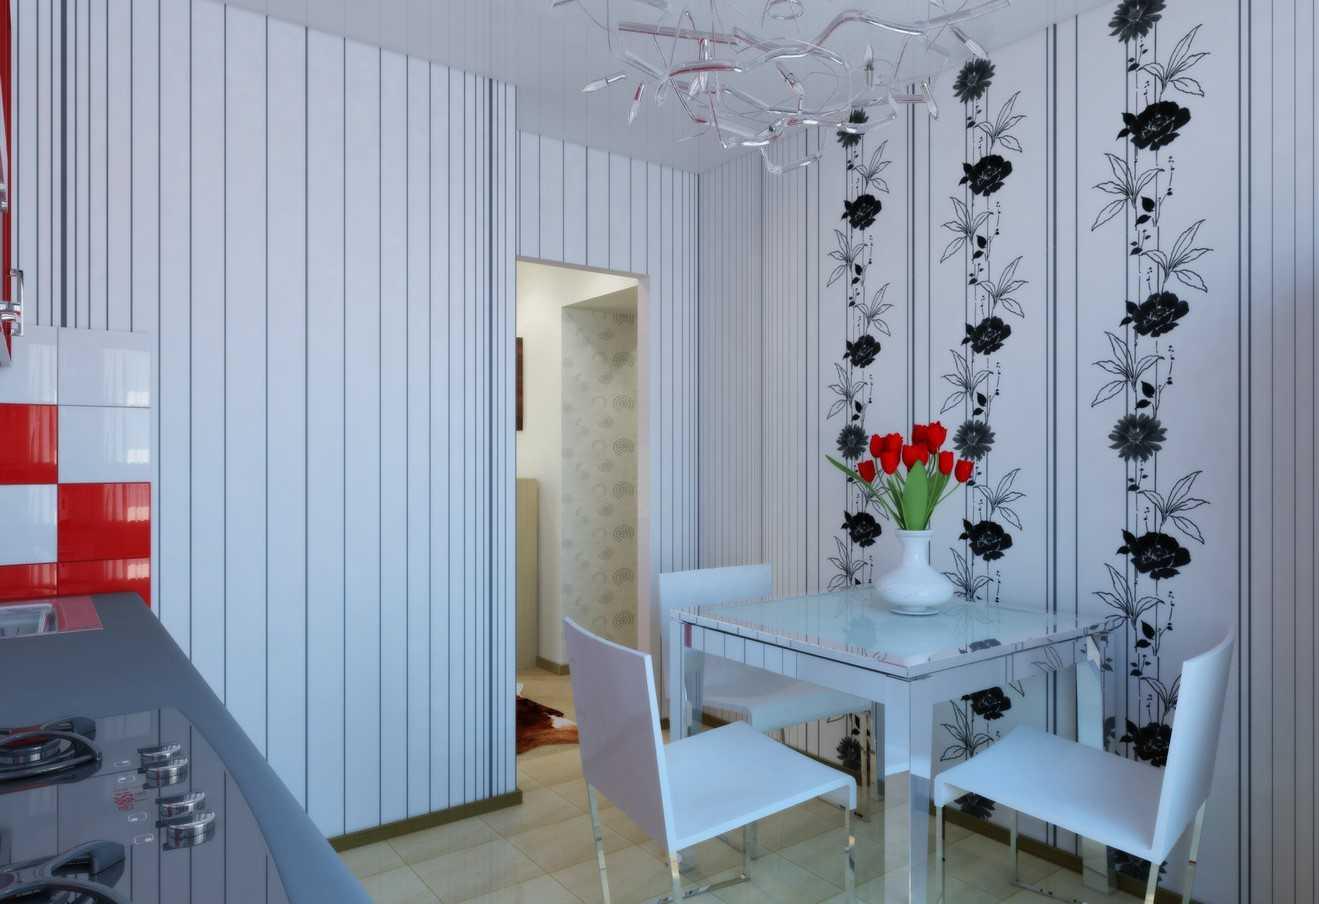 пластиковые панели для стен на кухне фото экстракта можно